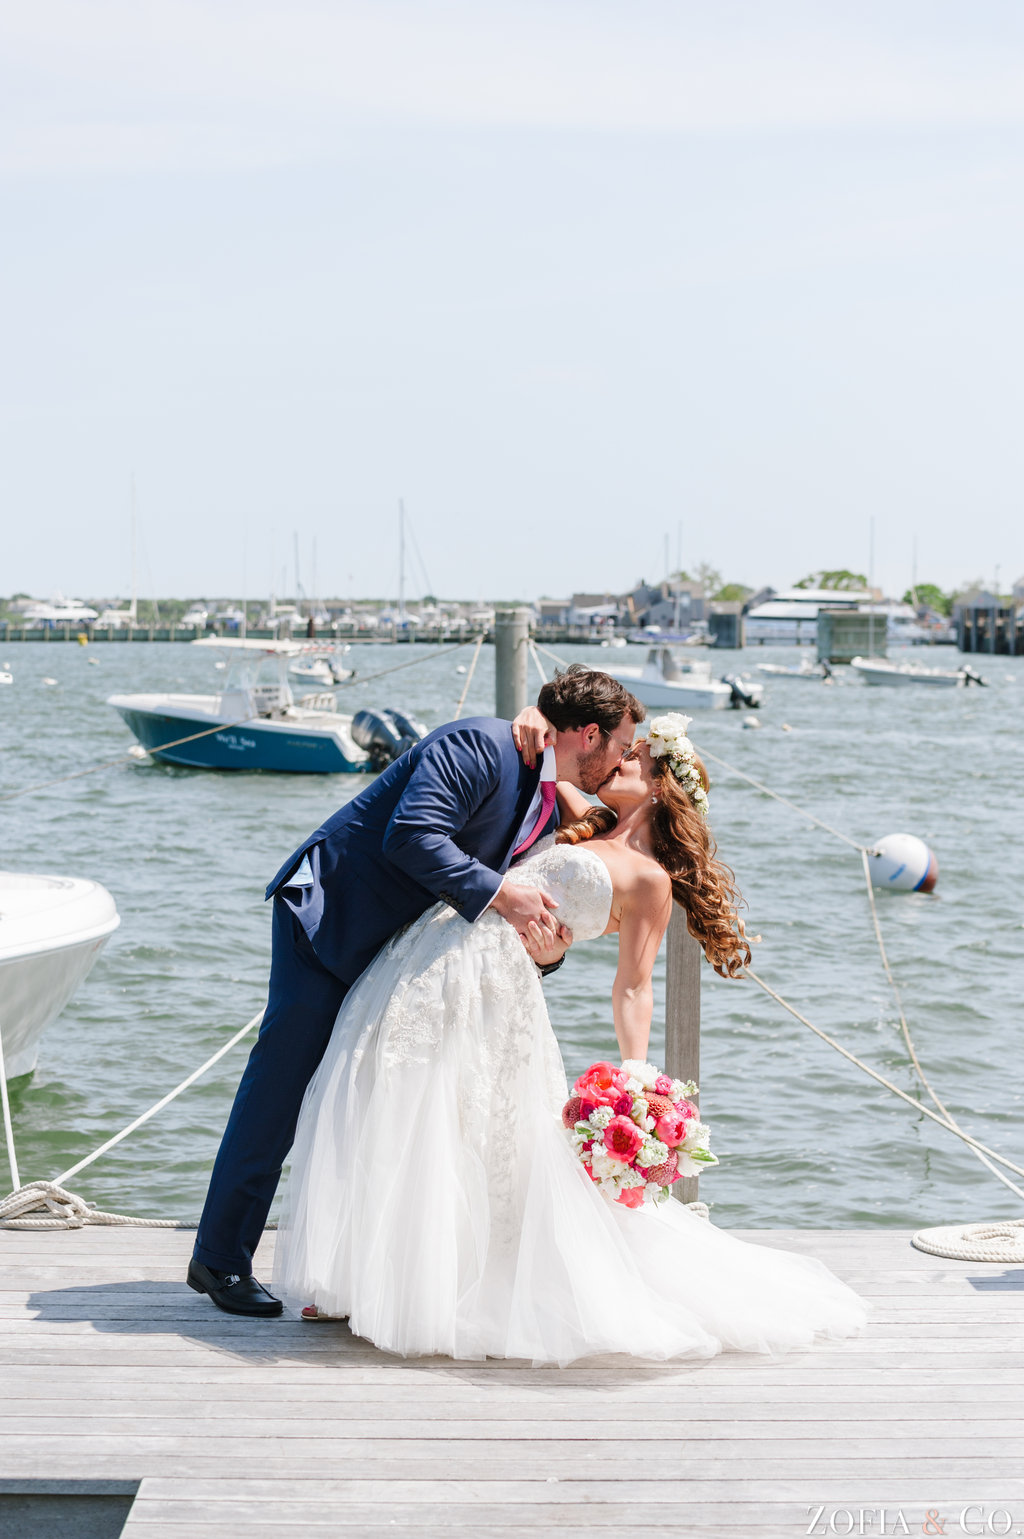 Ceci_New_York_Style_Luxury_Custom_Summer_Wedding_CeciBride_Nautical_Blue_Gold_Letterpress_Foil_35.jpg